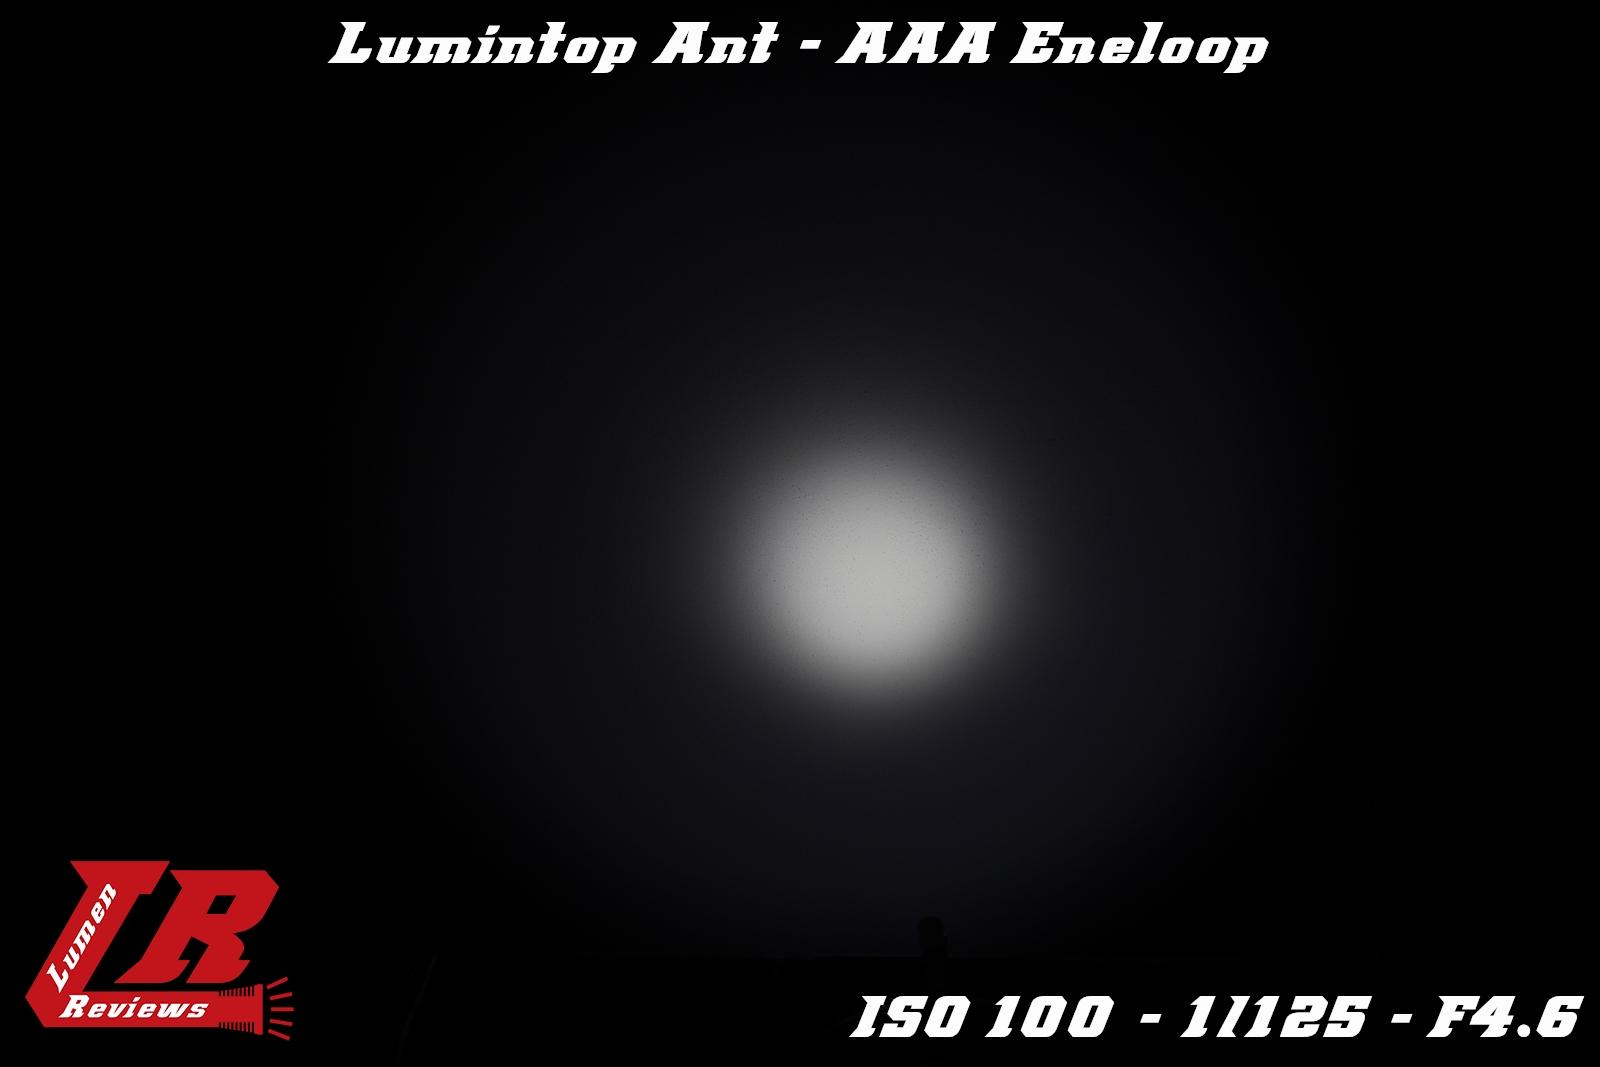 Lumintop Ant 27